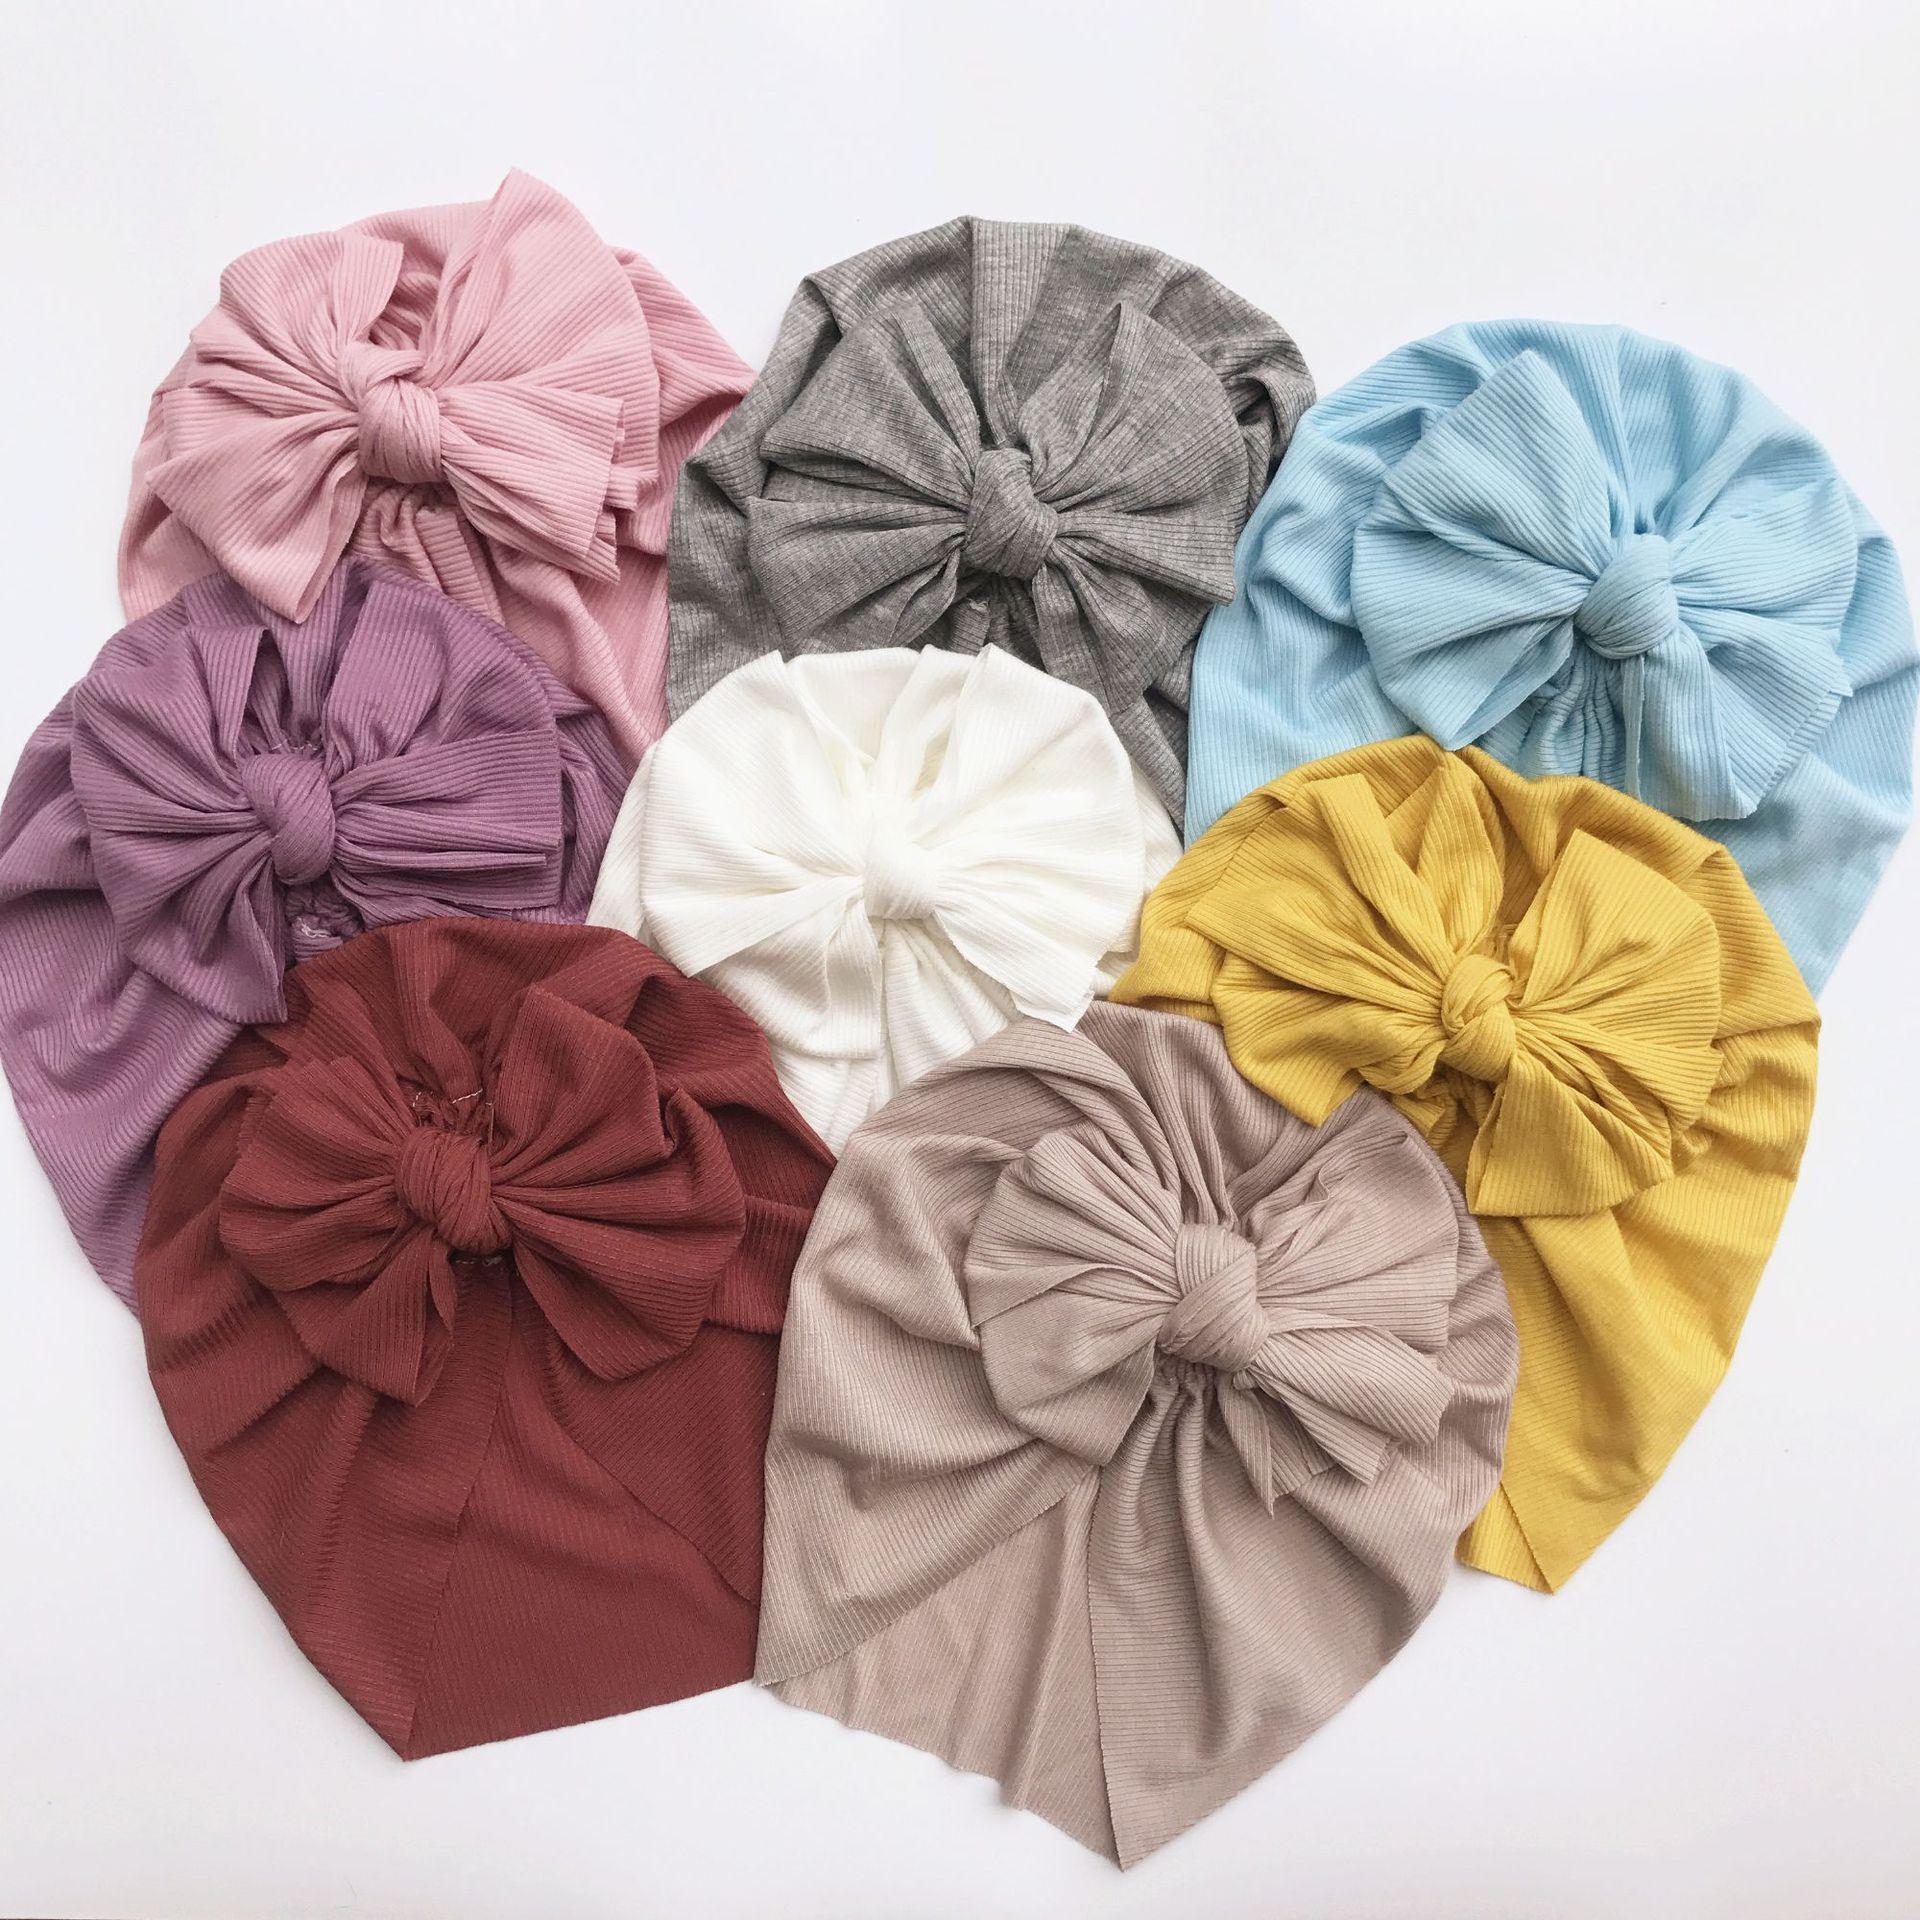 Lovely Flower Baby Hat Soft Cotton Baby Girl Hat Turban Infant Toddler Newborn Baby Cap Bonnet Headwraps Kids Hat Beanie